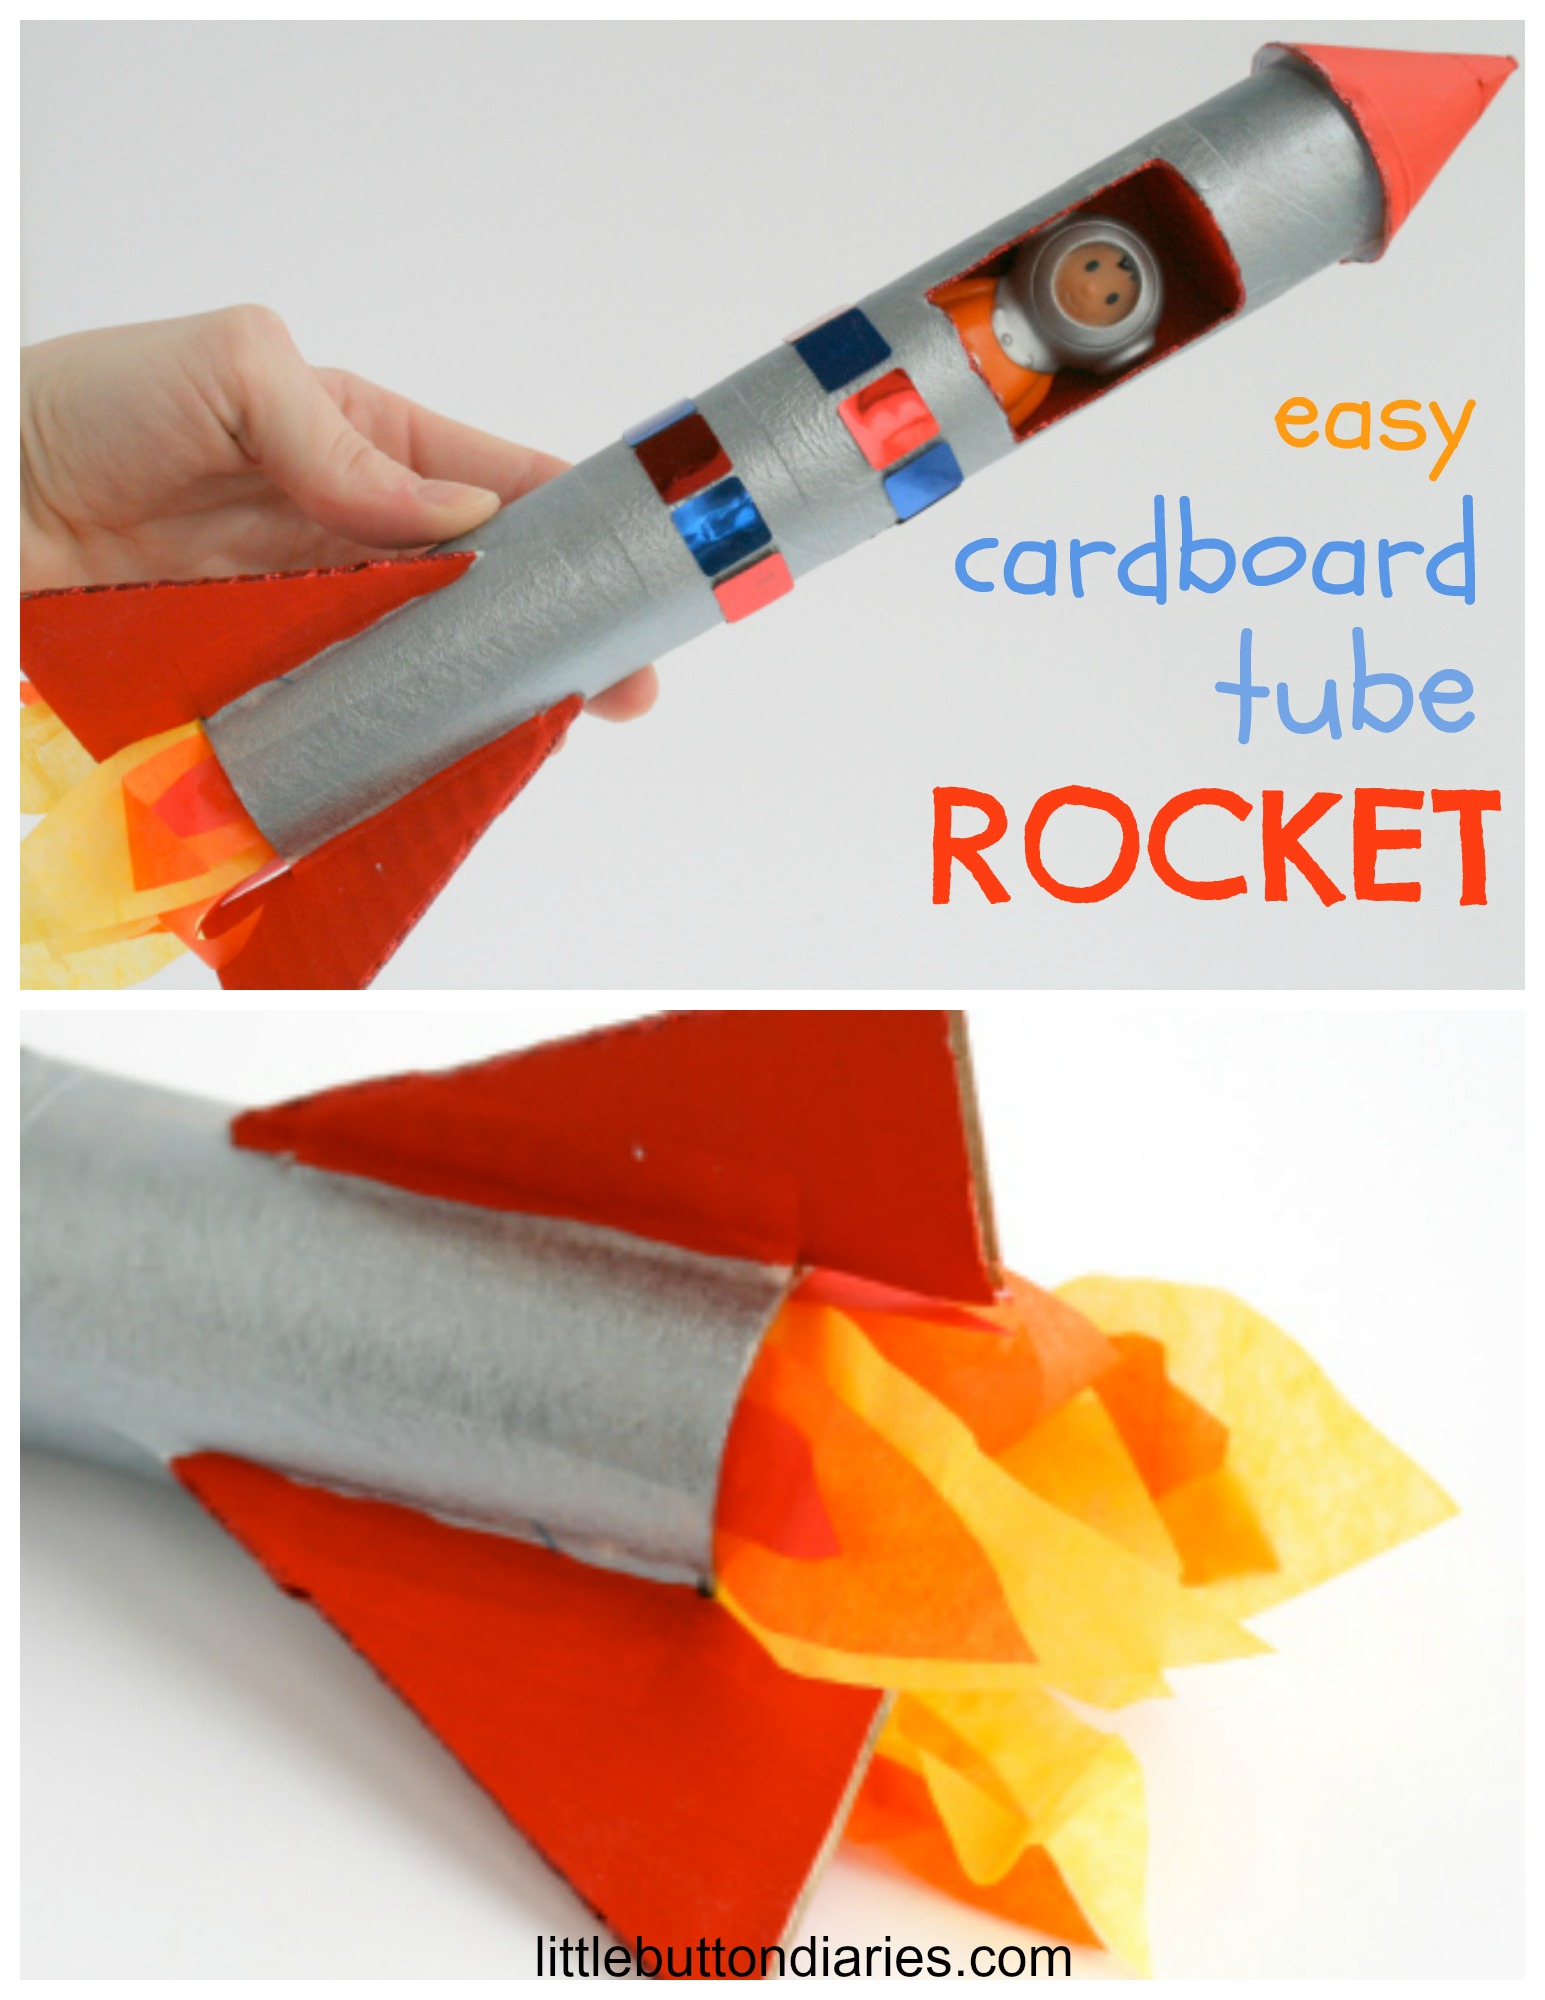 Kids Project Cardboard Tube